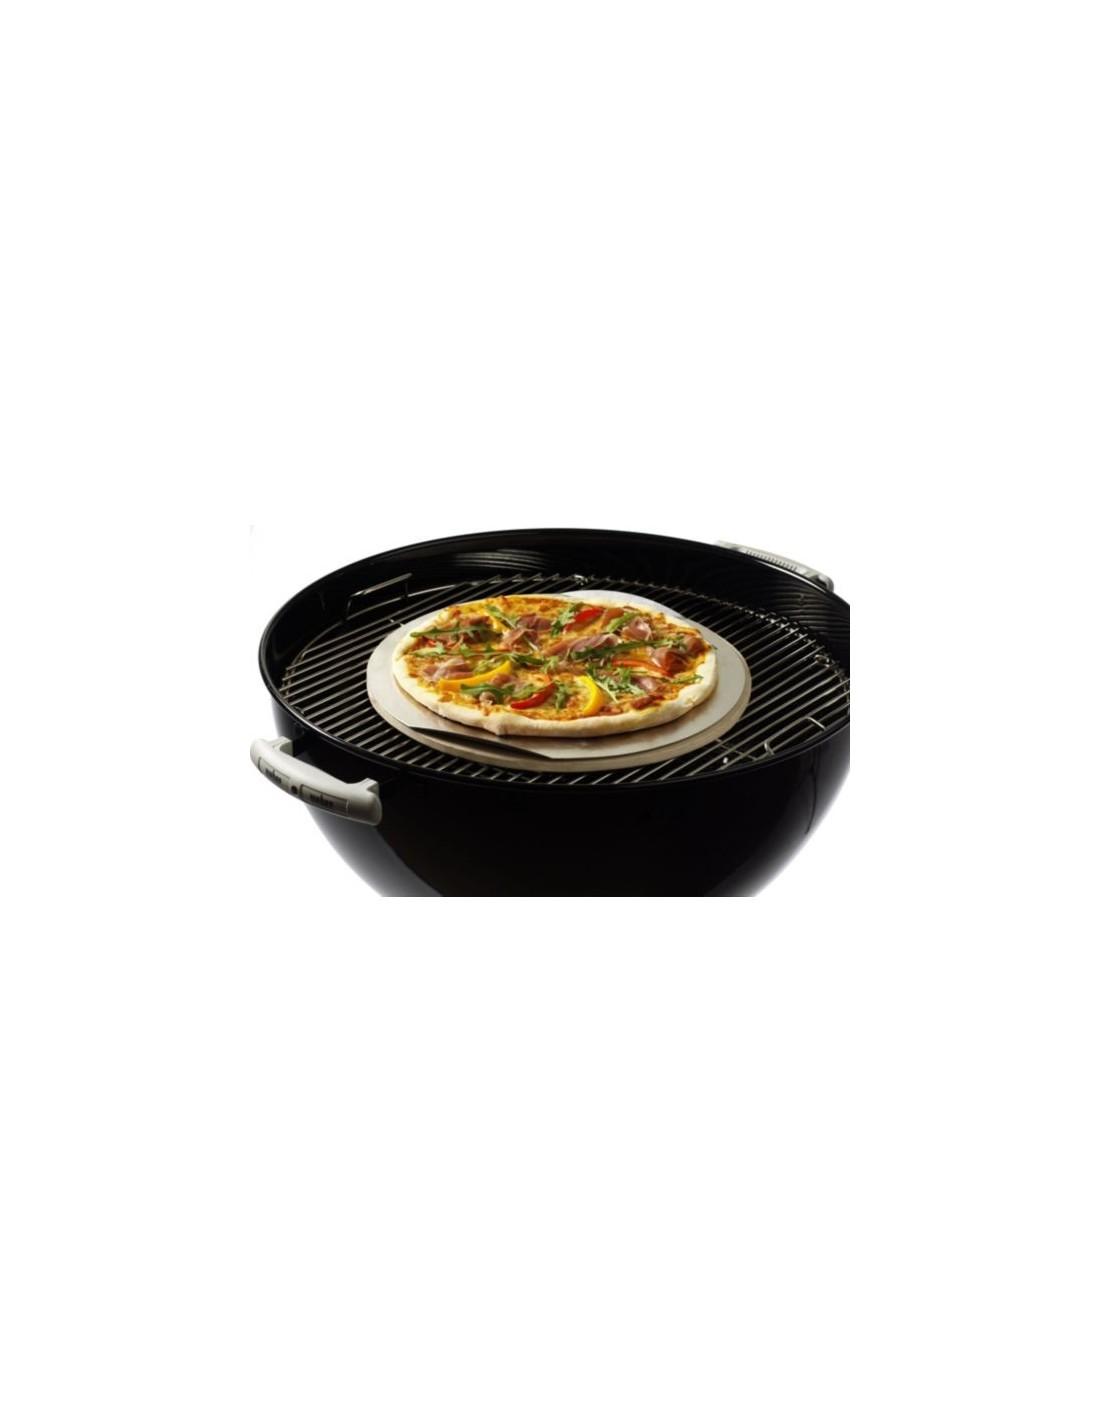 pierre pizza weber 36 cm pour barbecue charbon weber. Black Bedroom Furniture Sets. Home Design Ideas